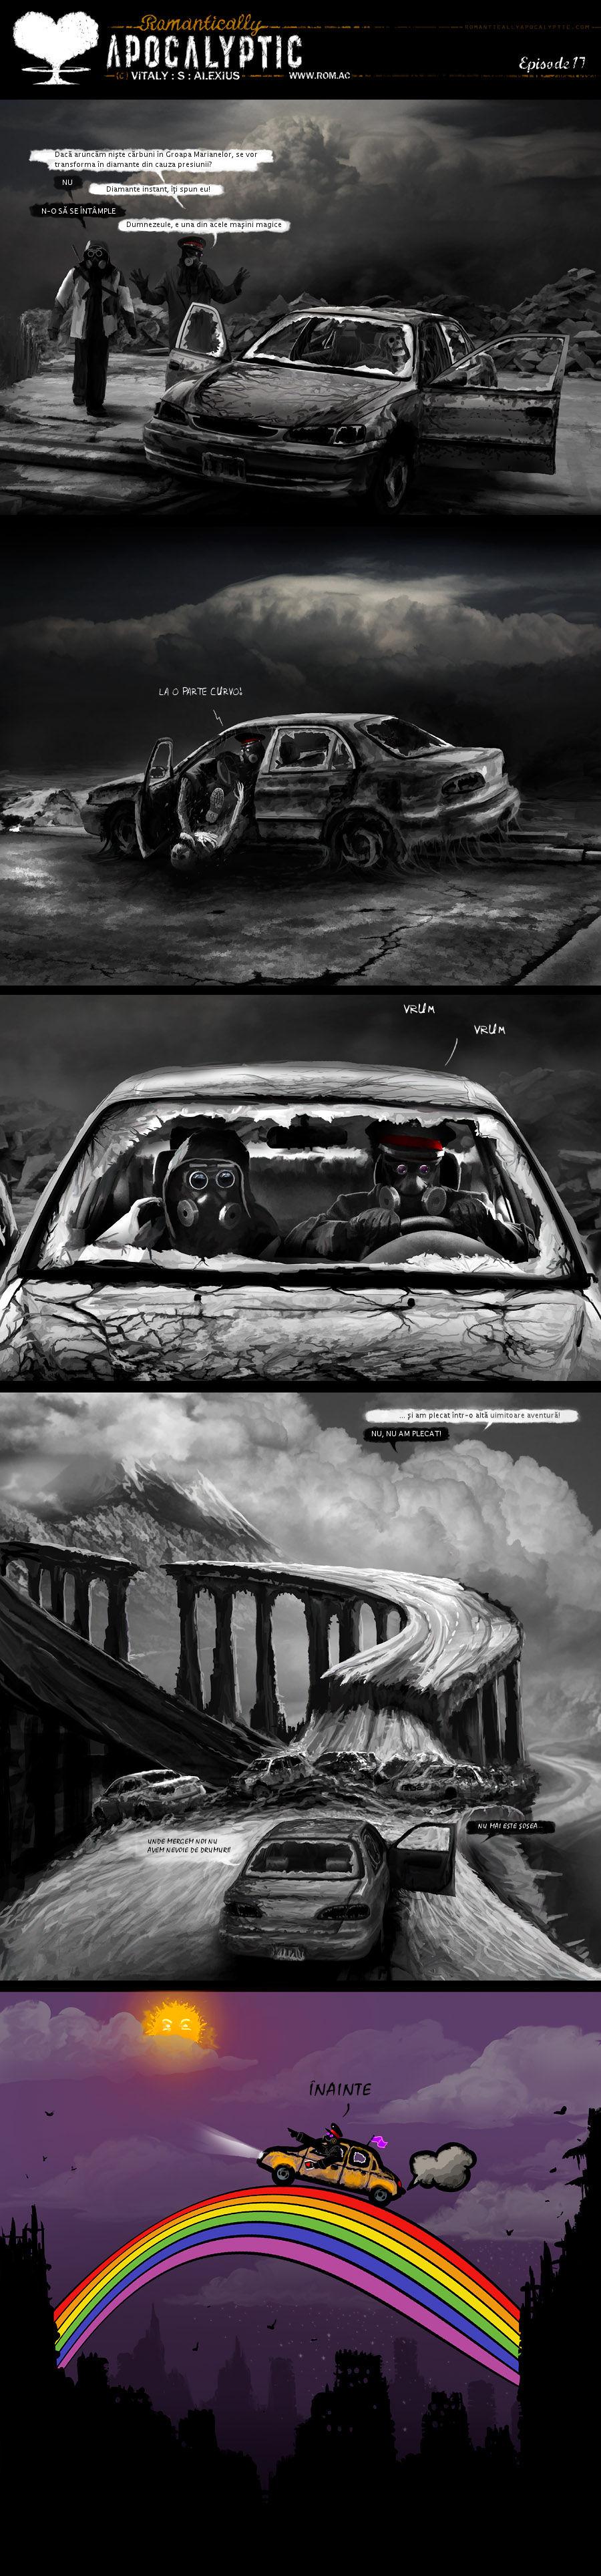 Romantically Apocalyptic 17 Ro by duleantovi